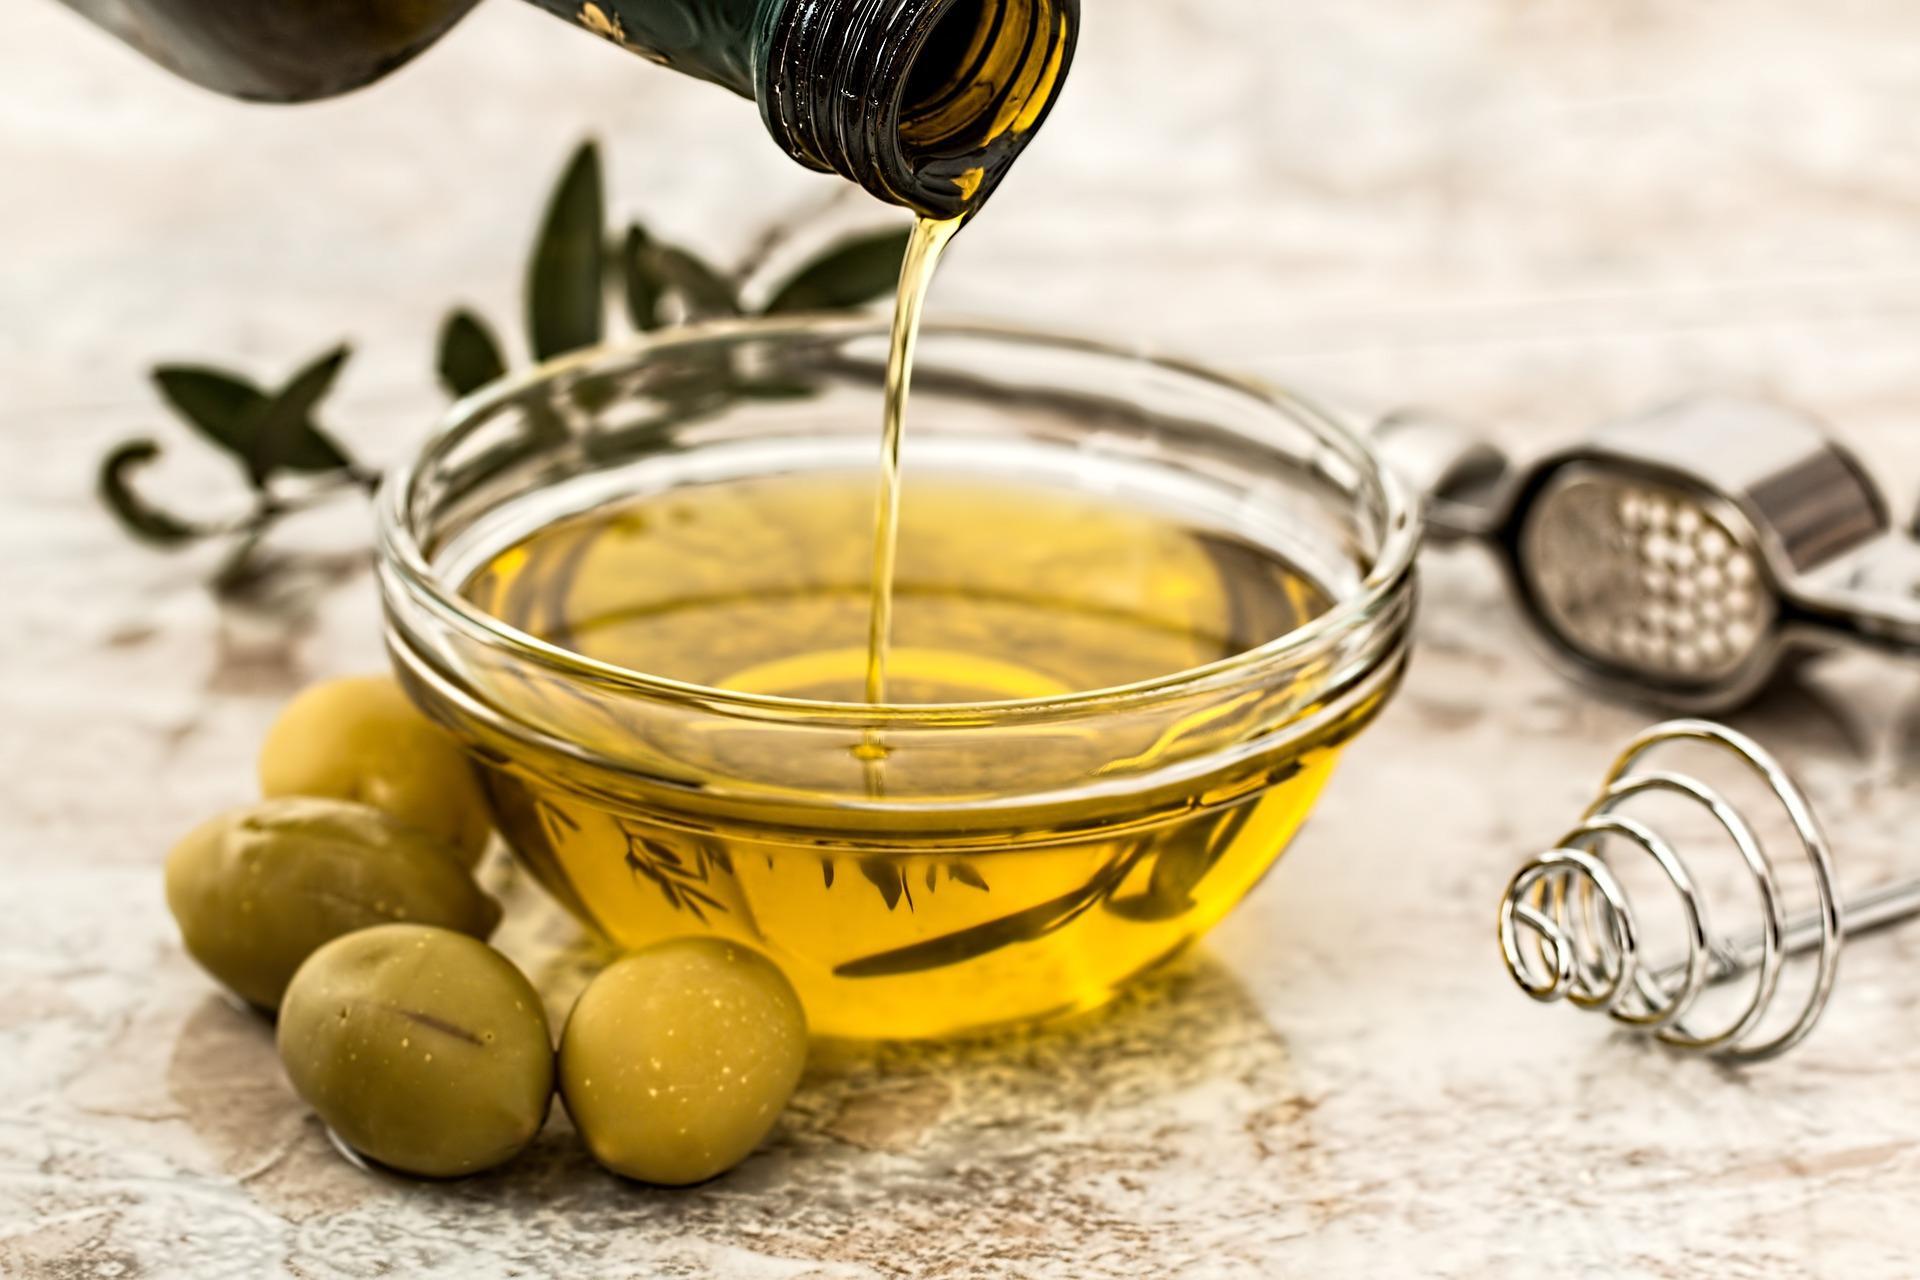 olive-oil-968657_1920-1494346473240.jpg